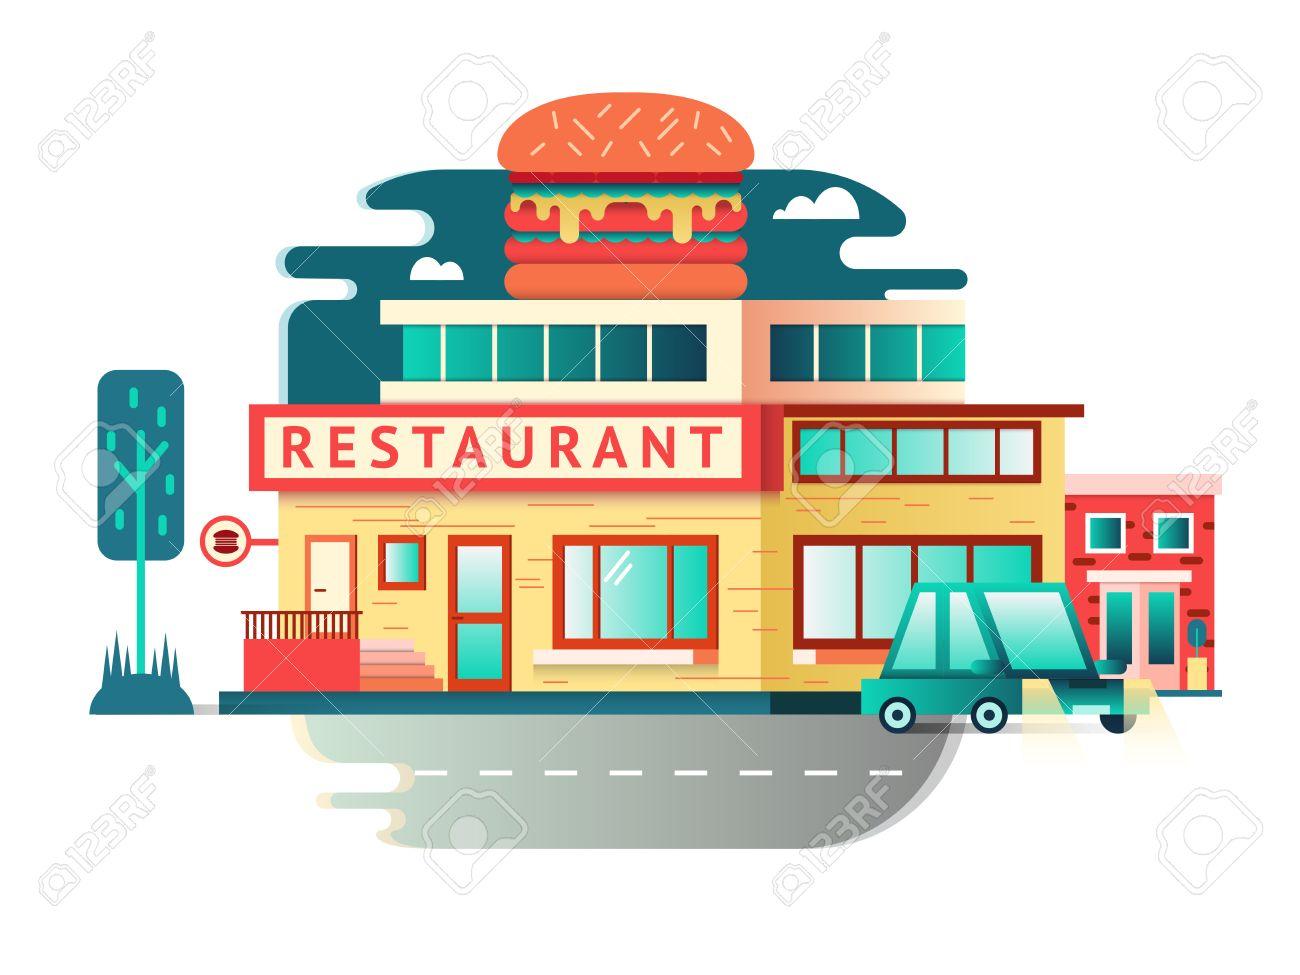 Restaurant building flat design architecture facade food cafe construction vector illustration stock vector